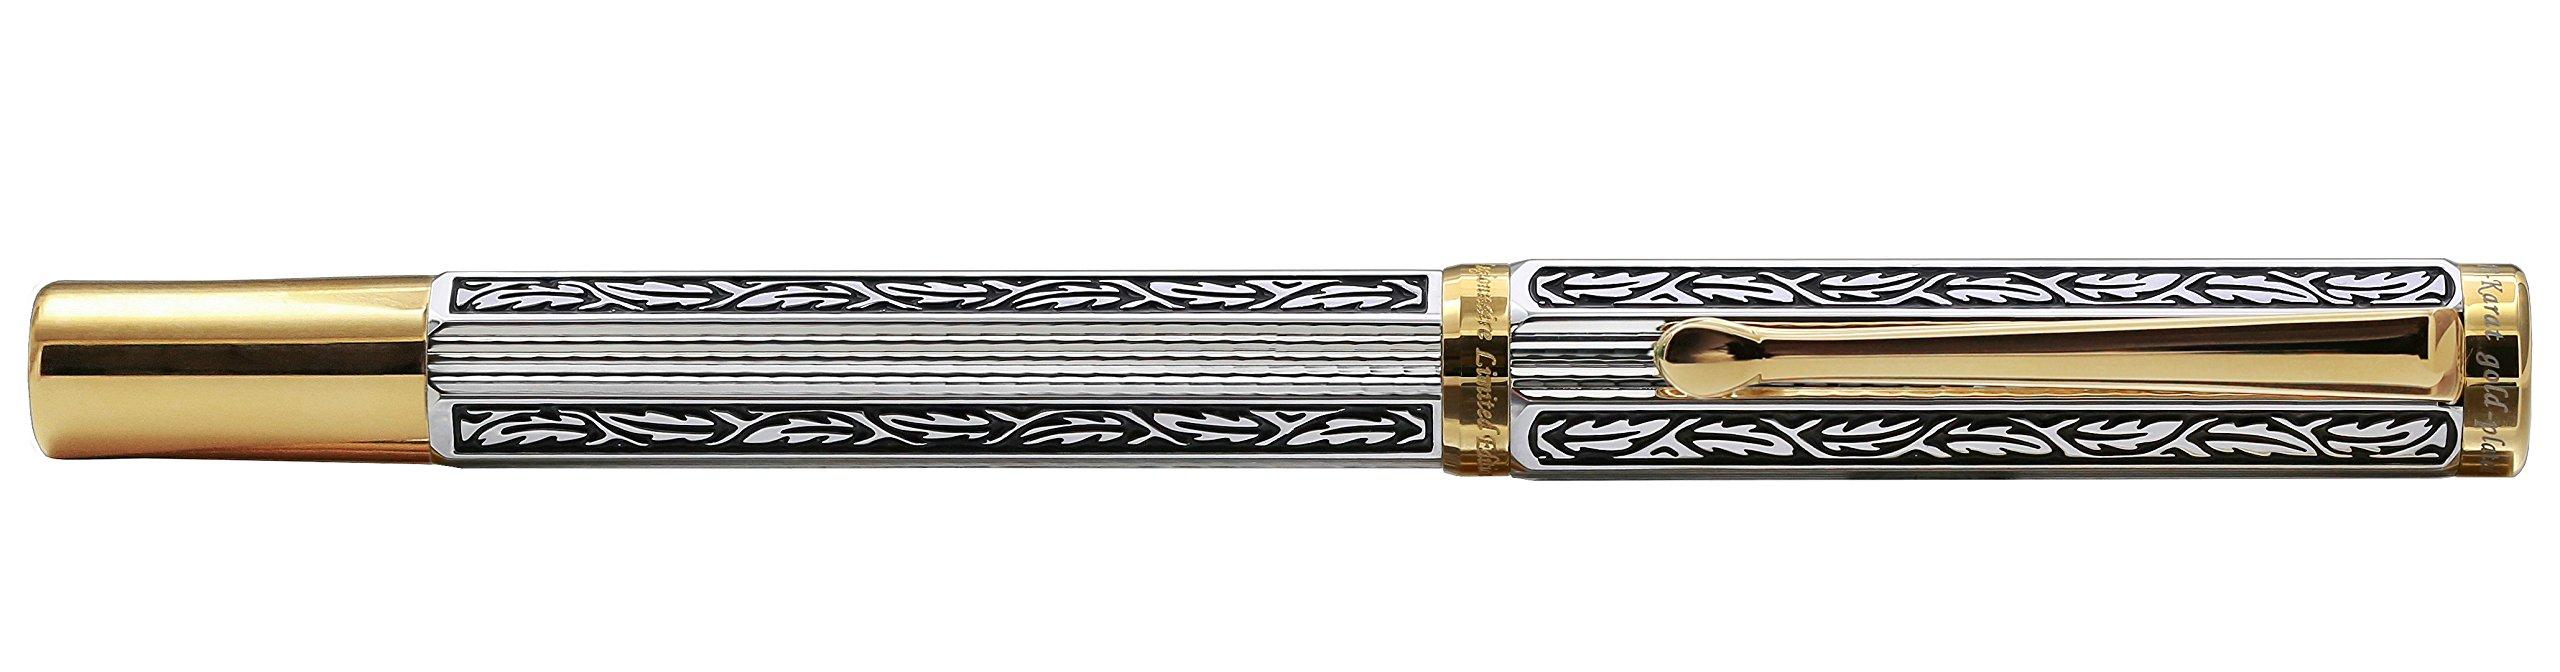 Xezo Legionnaire 18-Karat Gold, Platinum Plated MEDIUM-Point Fountain Pen, Art Nouveau Style, Diamond-Cut and Finely Hand-Etched (Legionnaire F-1) by Xezo (Image #2)